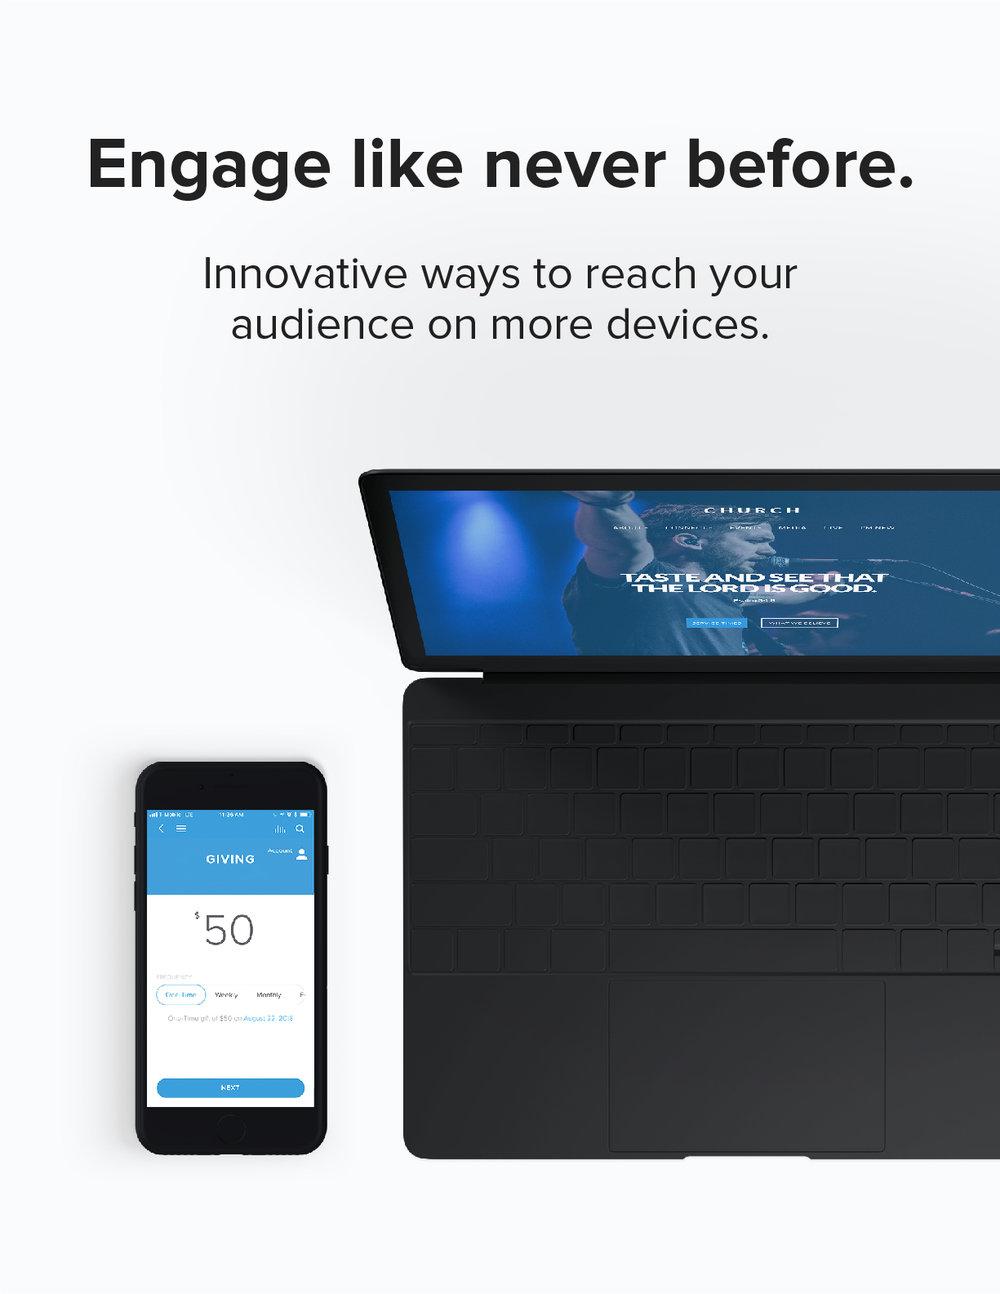 engage_like_never_before.jpg